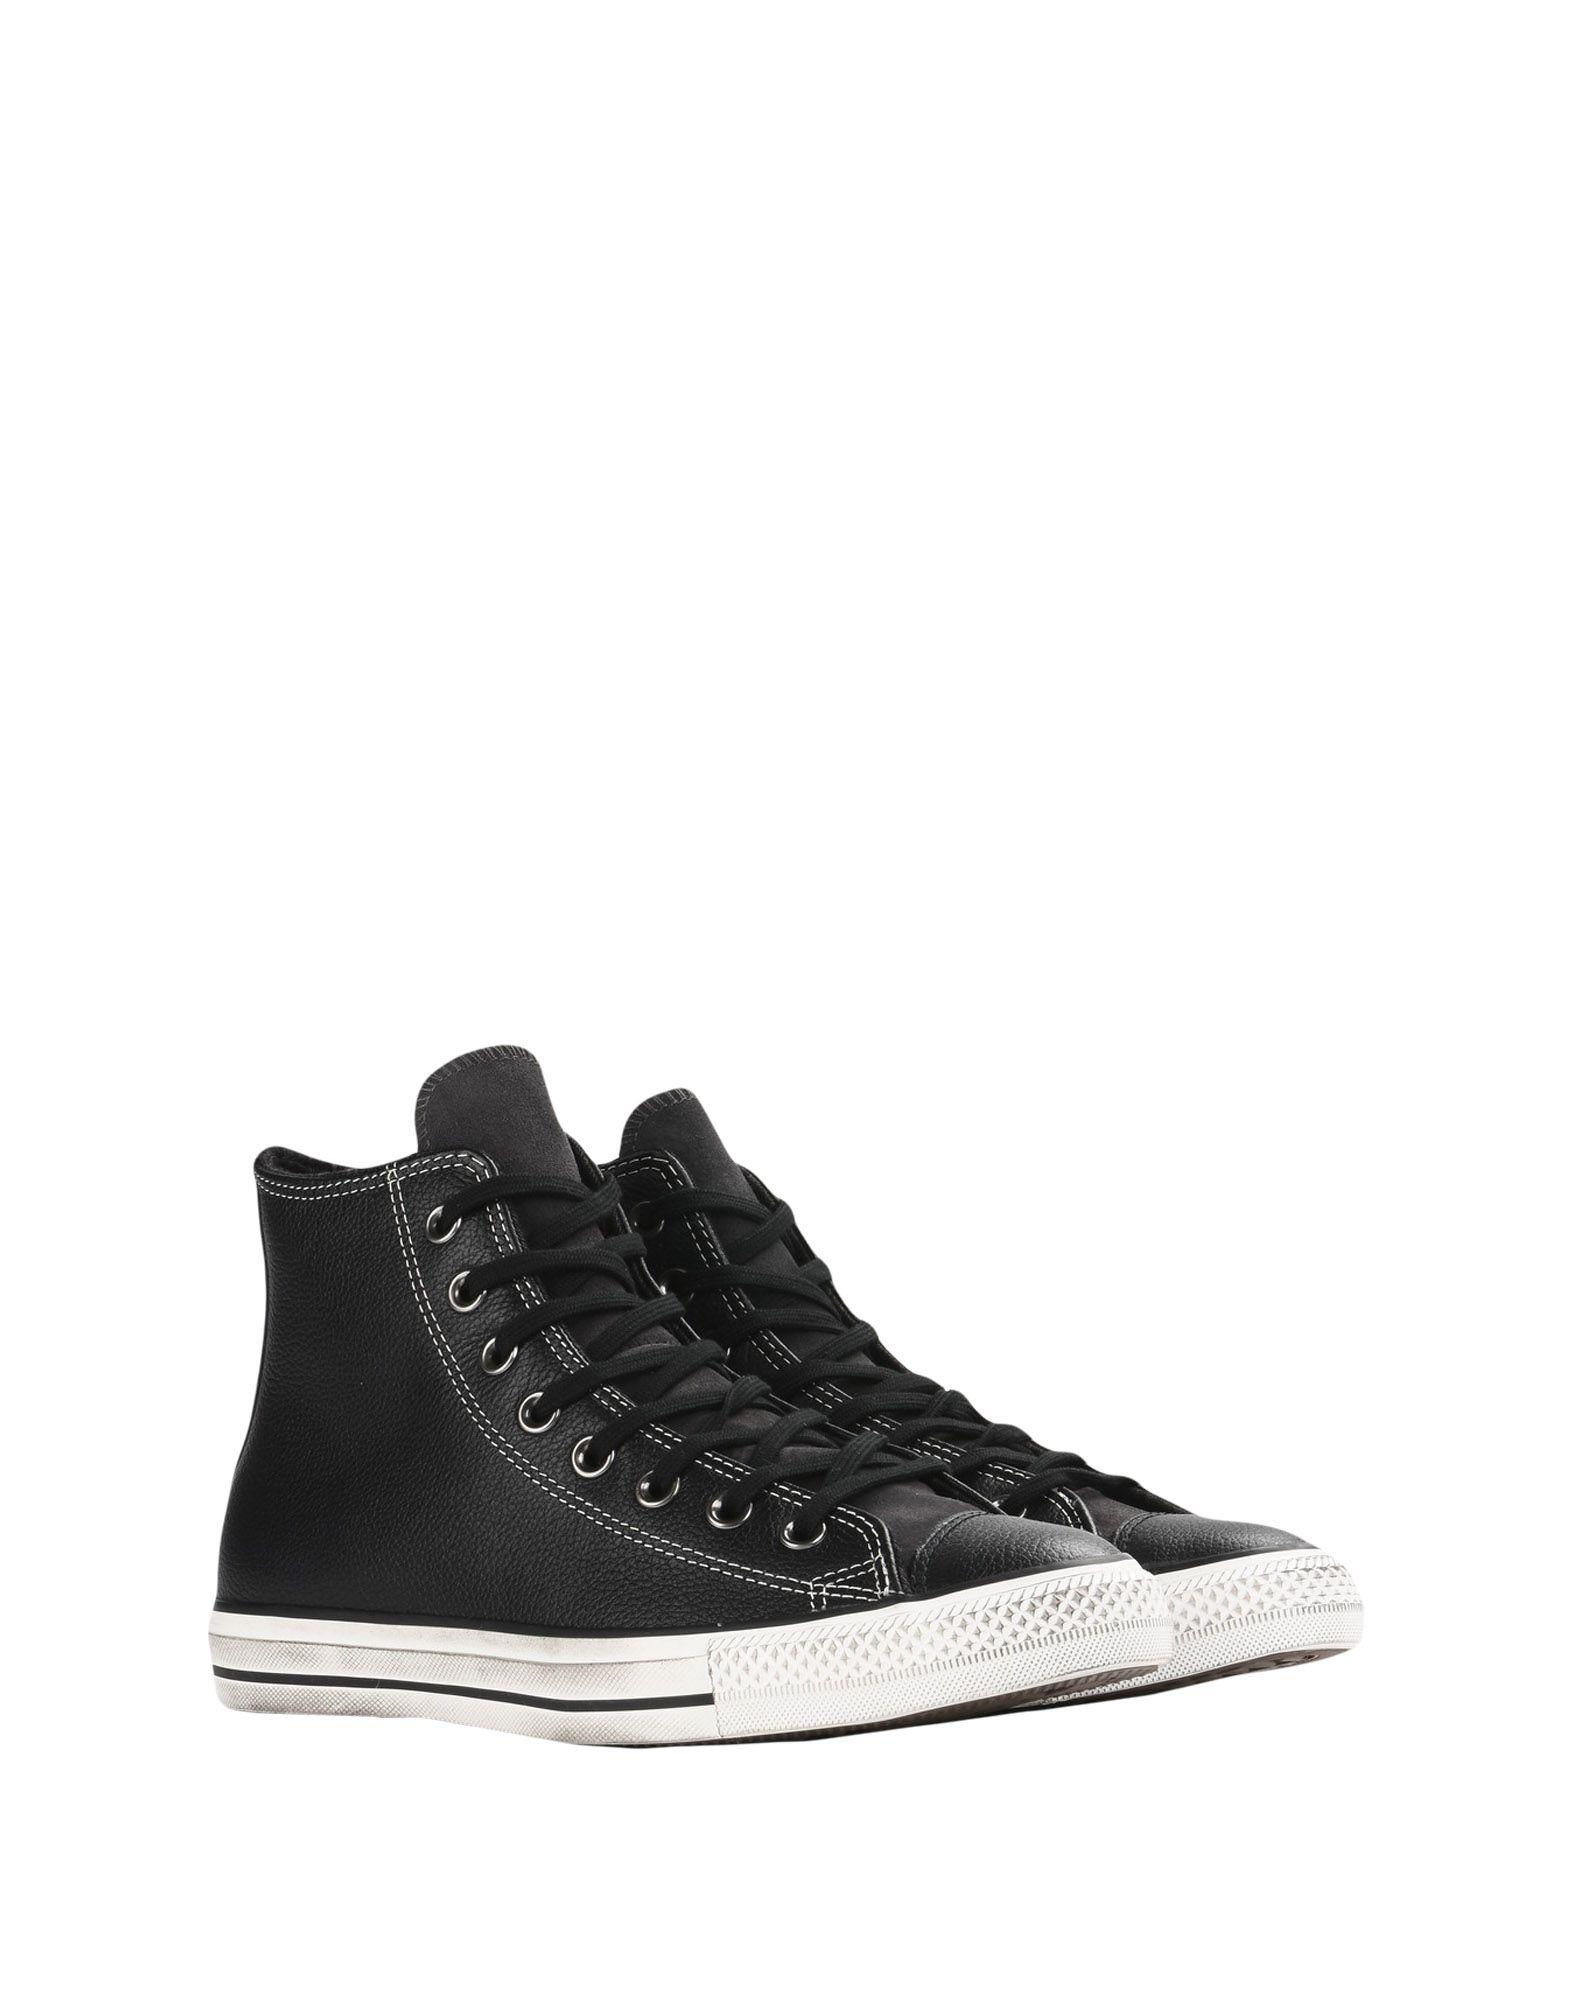 Rabatt echte Schuhe Converse Hi All Star Ct As Hi Converse Leather/Suede Distressed  11335879TG 57a1d6